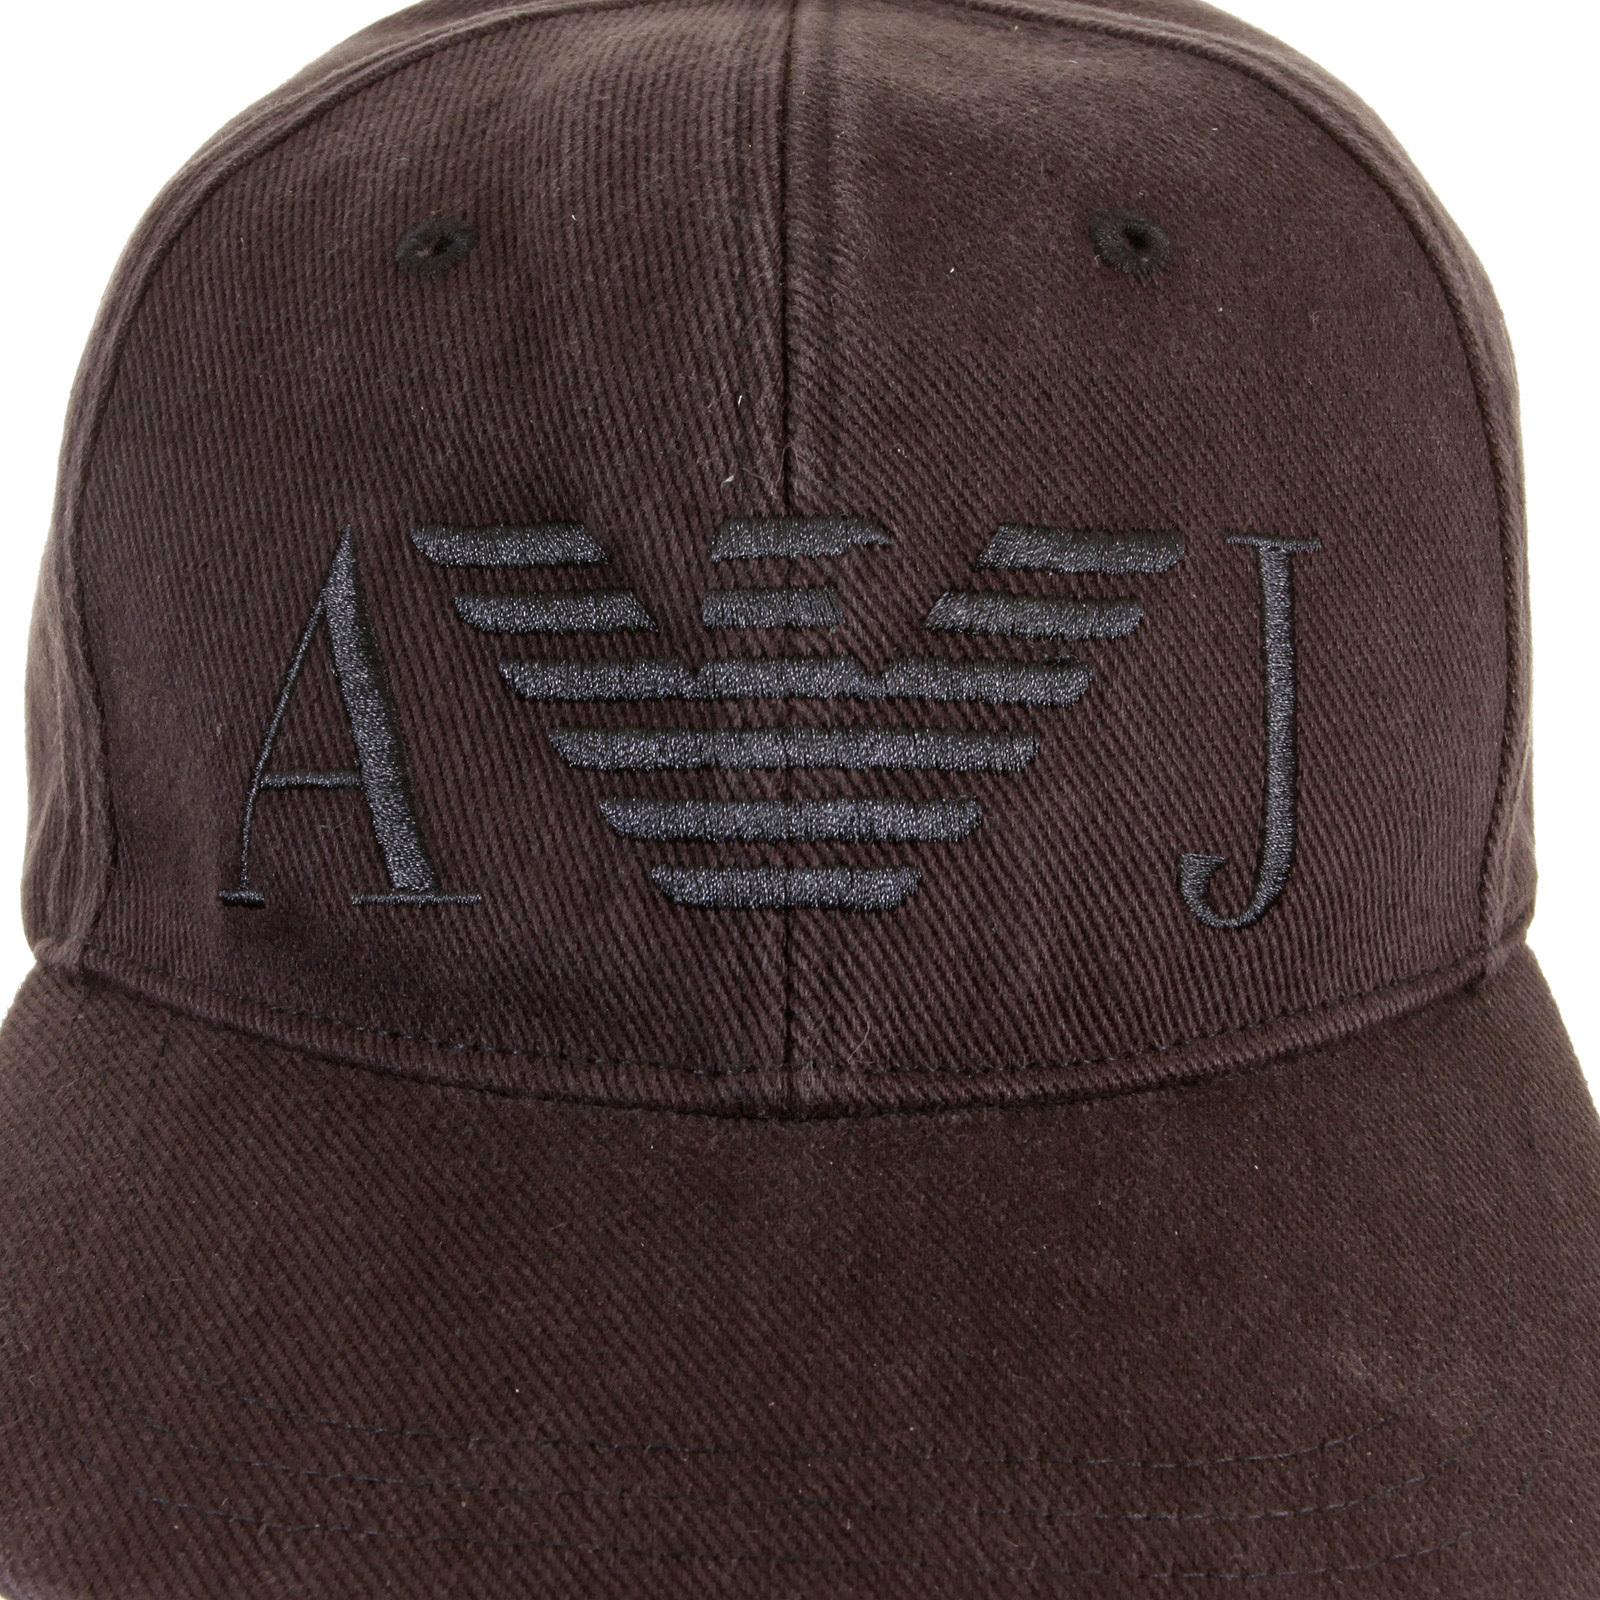 1cb8da2c7ee Armani Jeans navy baseball cap 06481 XE AJM2267 at Togged Clothing